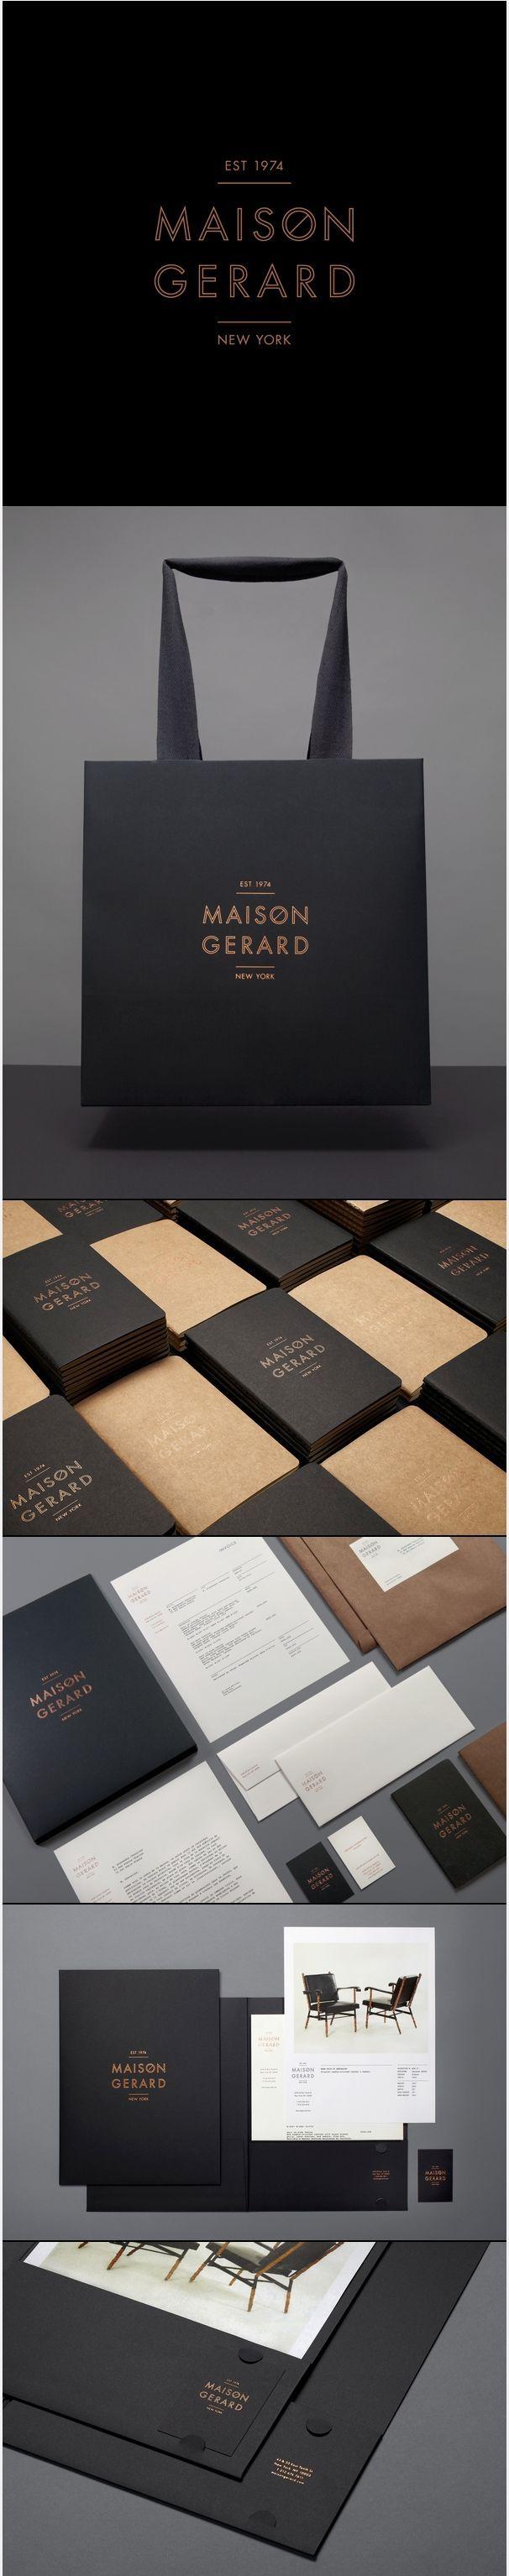 Branding Identite Graphique Cool Noir Or Carte De Visite Sac Commercial Maison Gerard